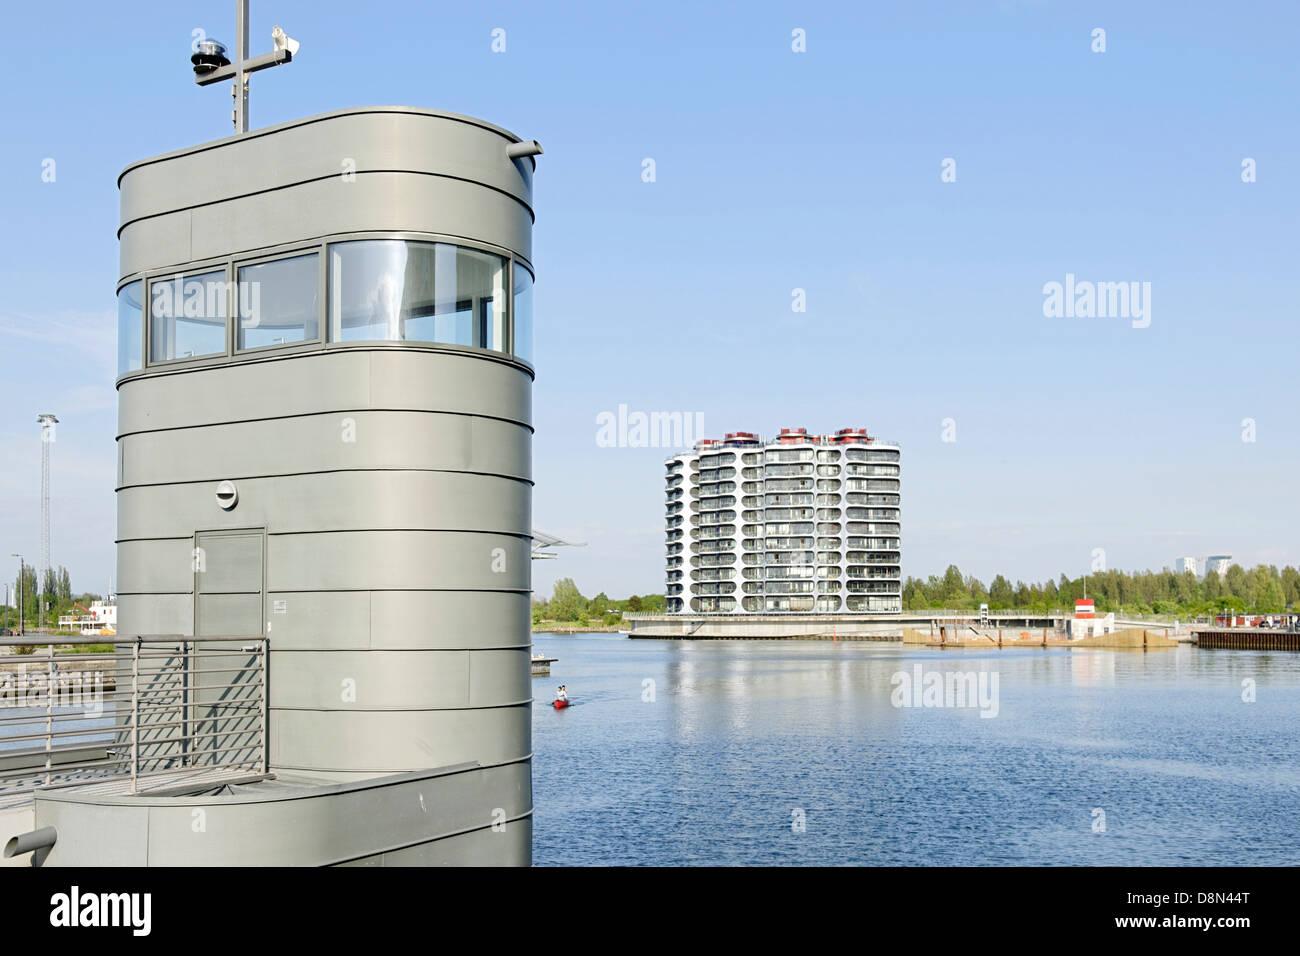 Modern architecture, Sluseholmen, Copenhagen, Denmark, Europe - Stock Image